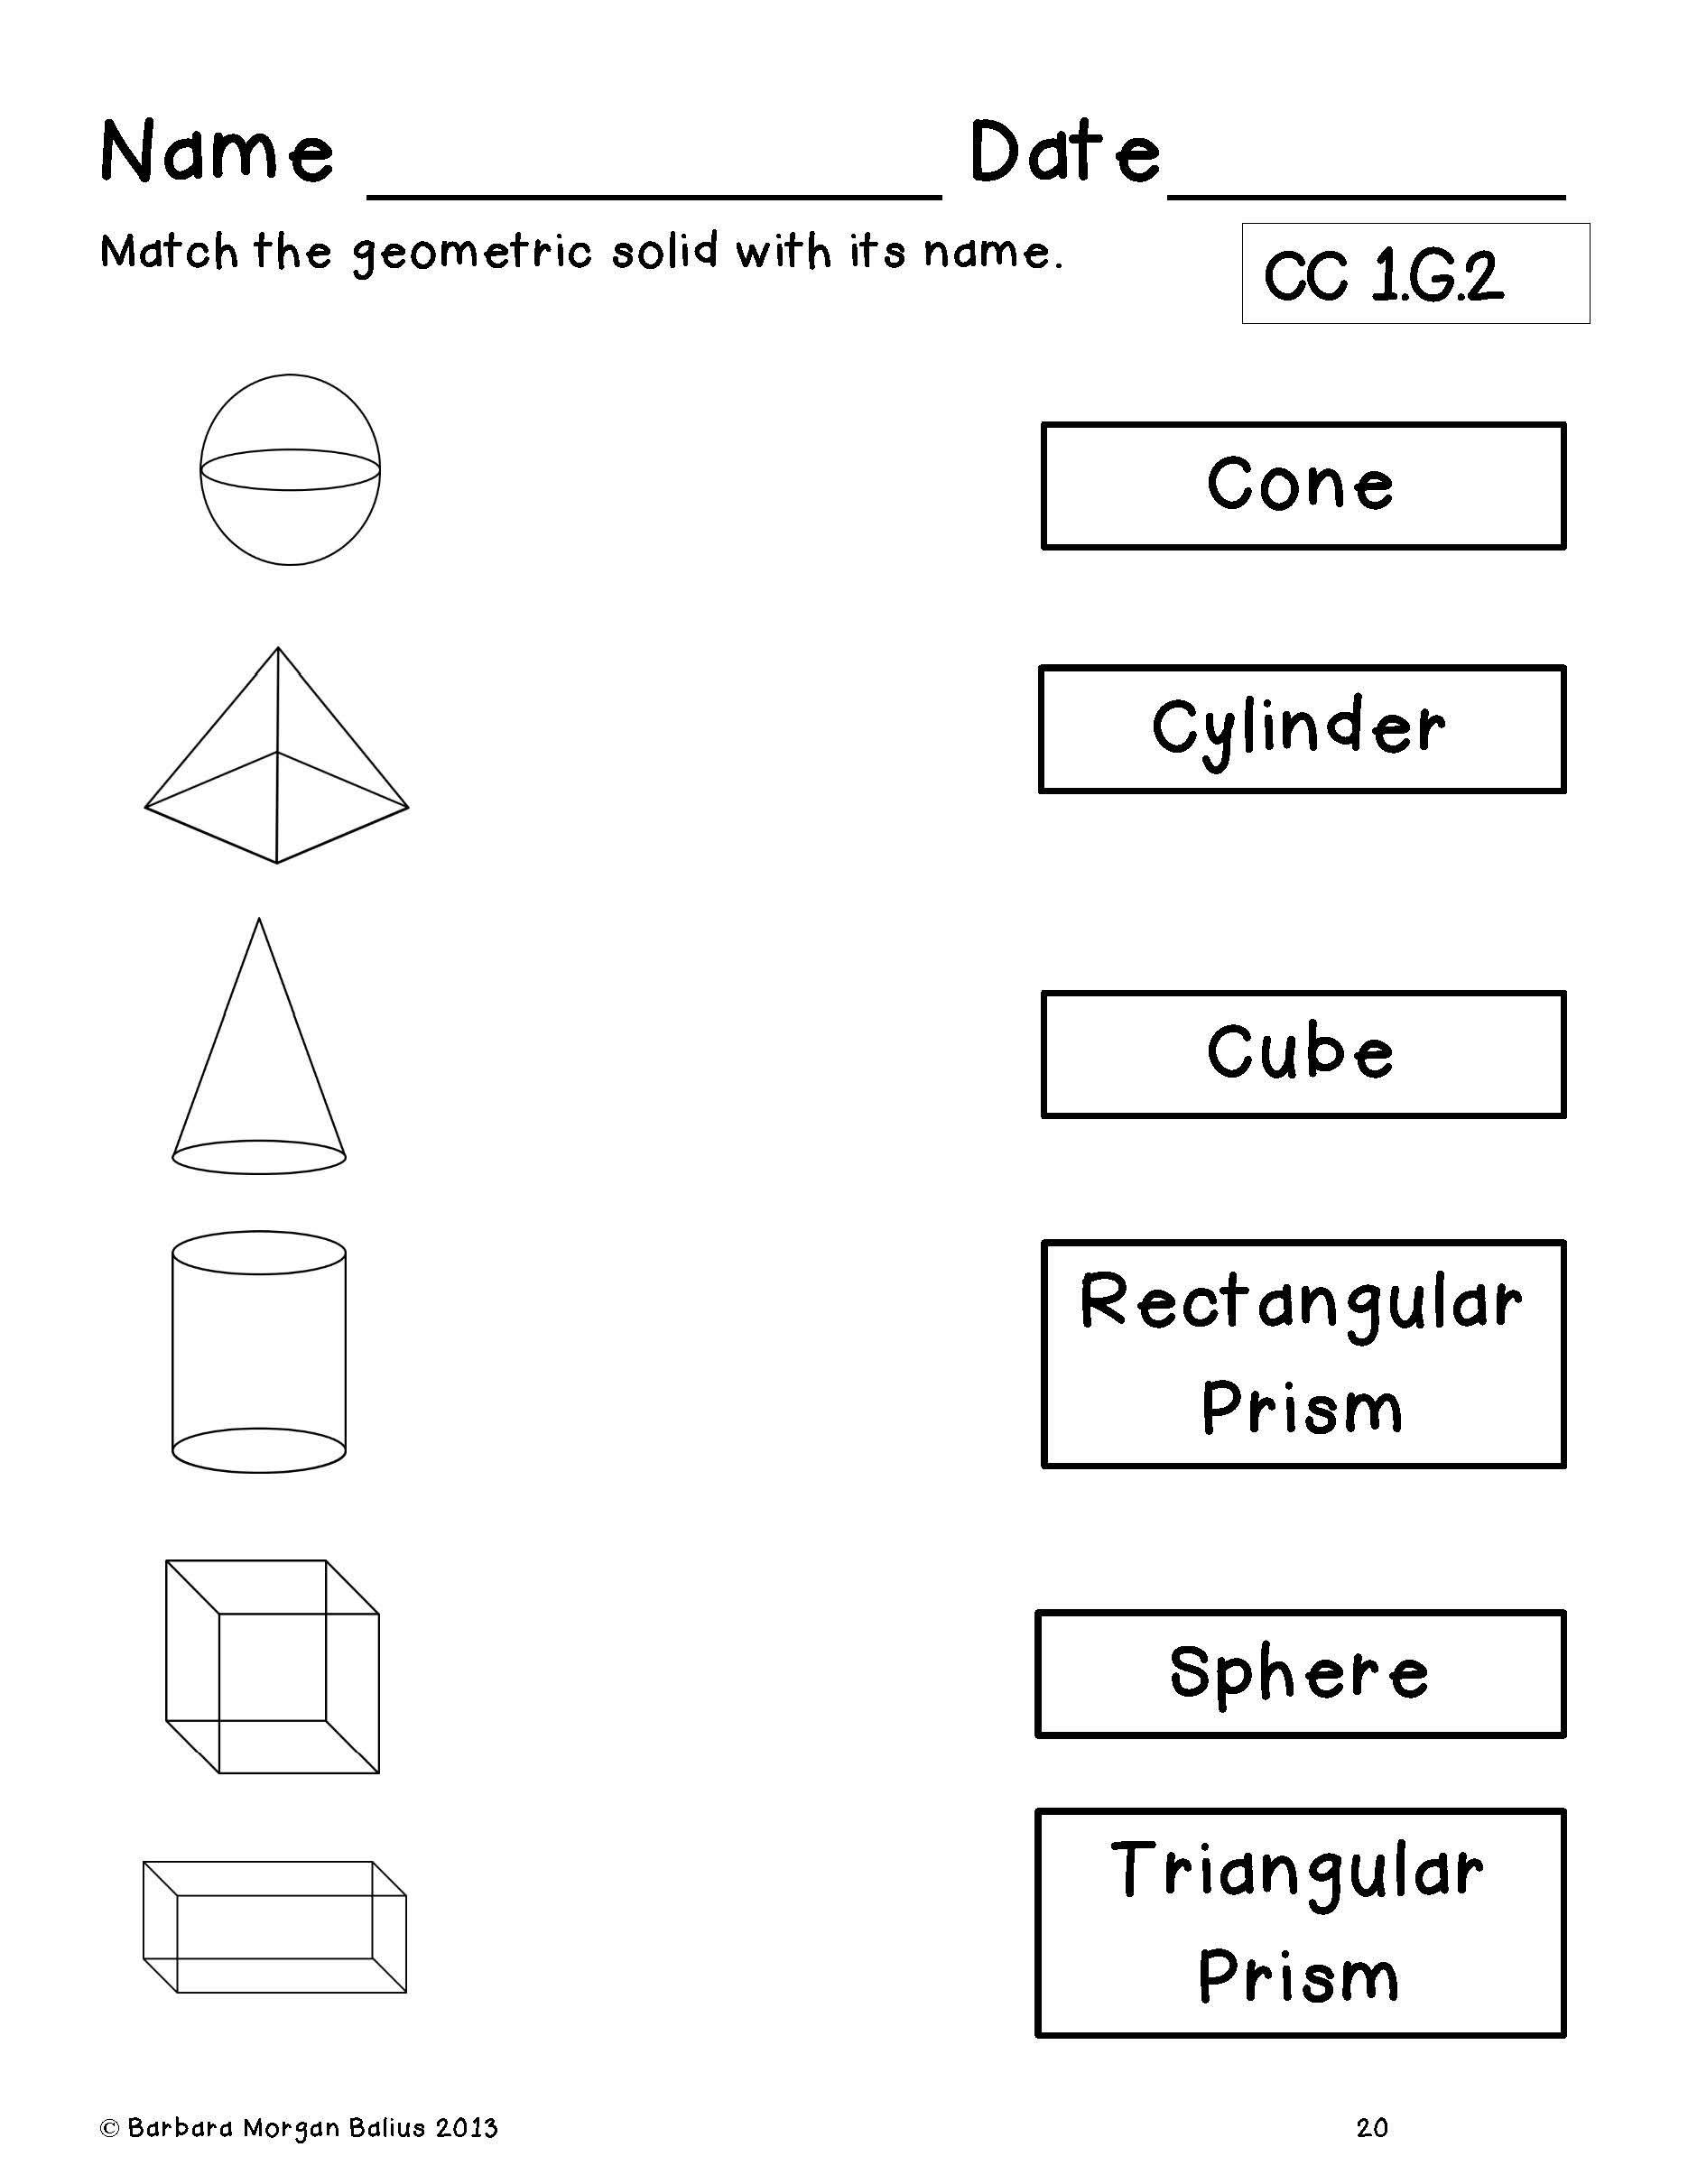 Matematiker online dating